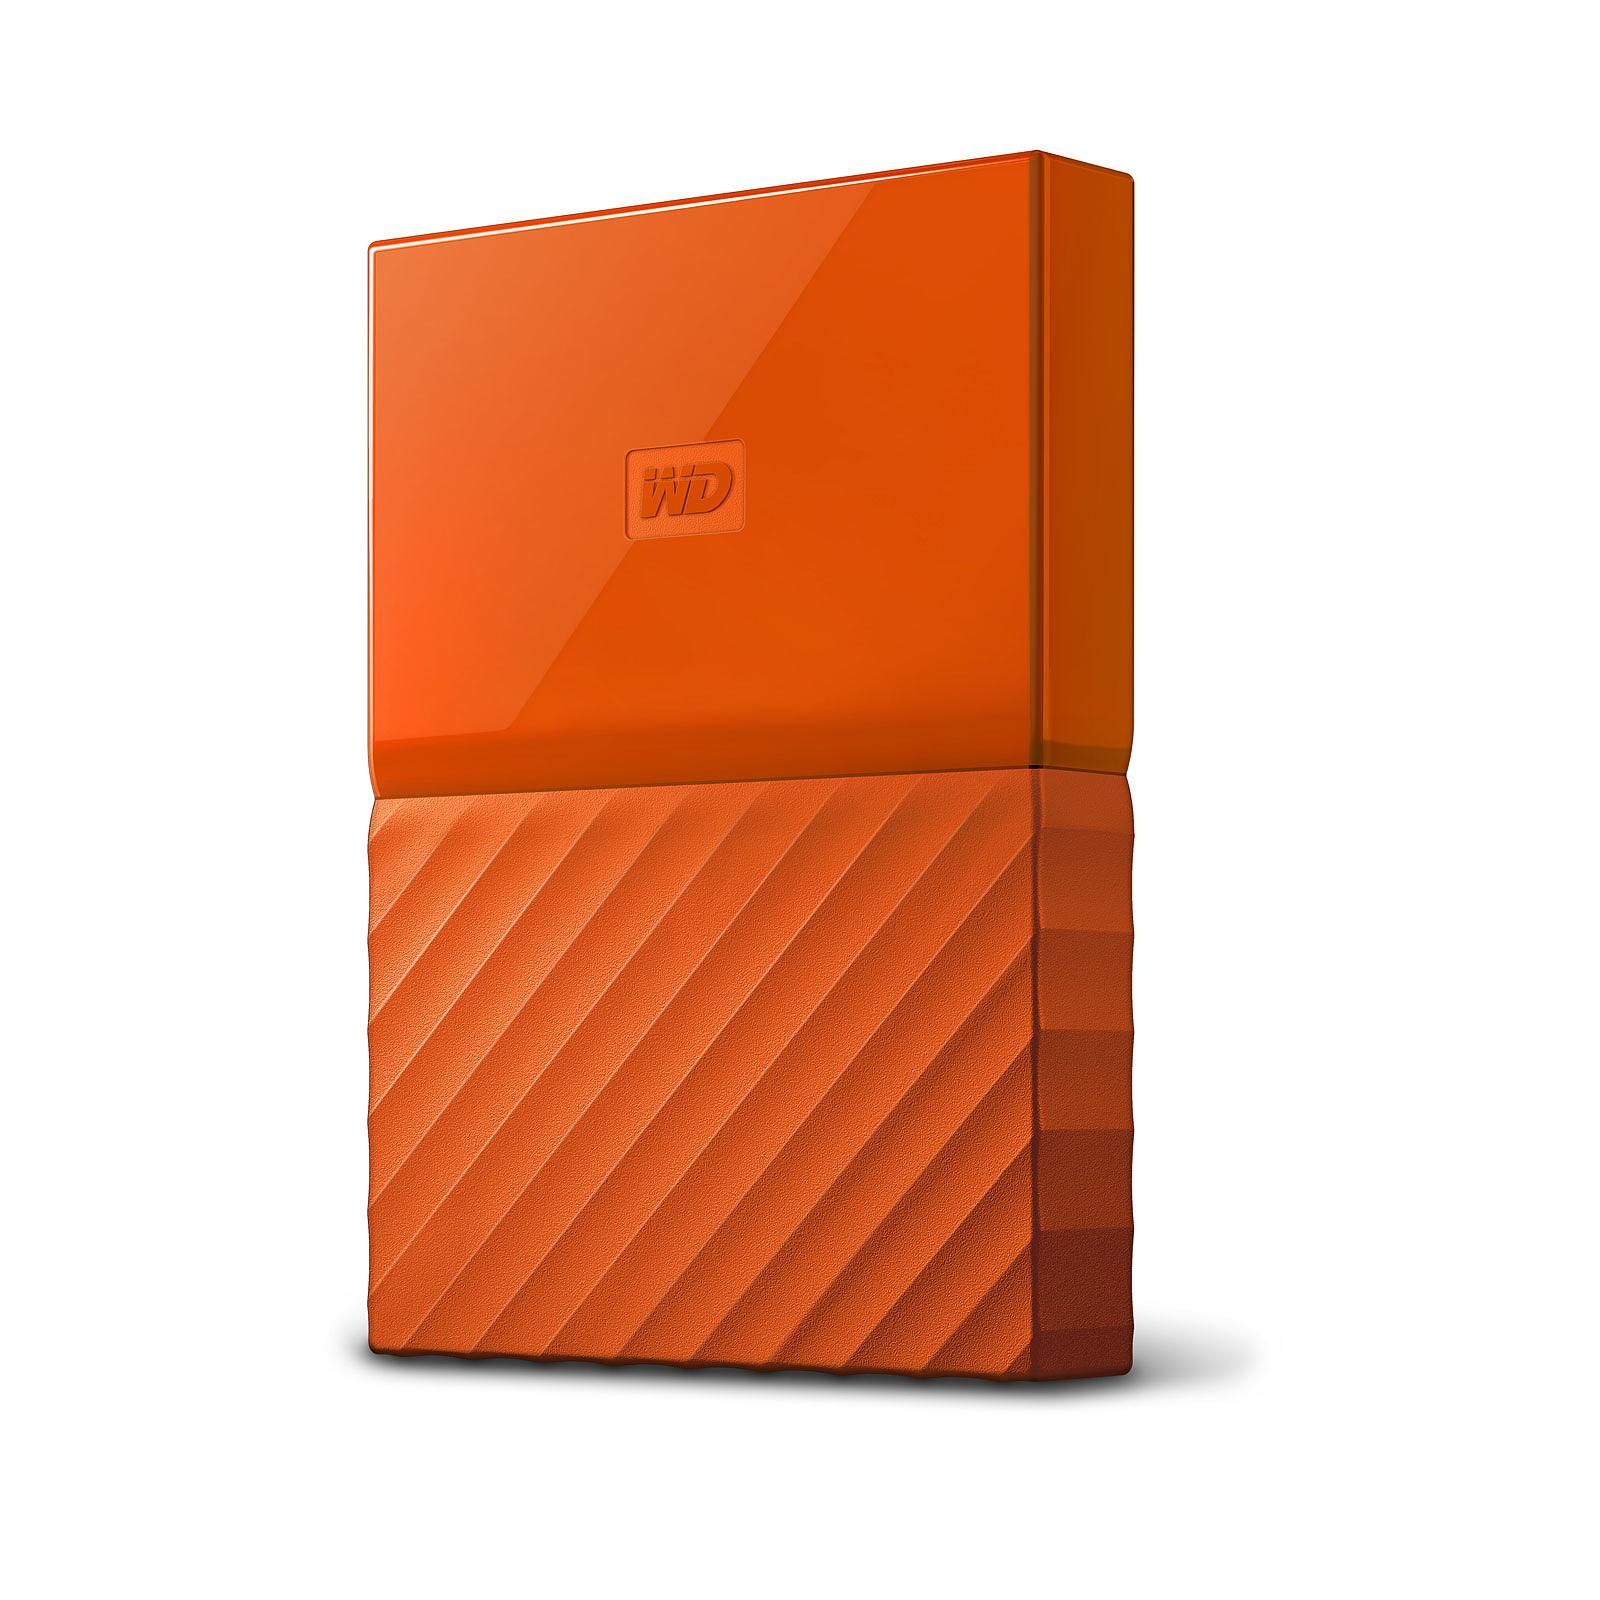 WD My Passport 3 To Orange (USB 3.0)